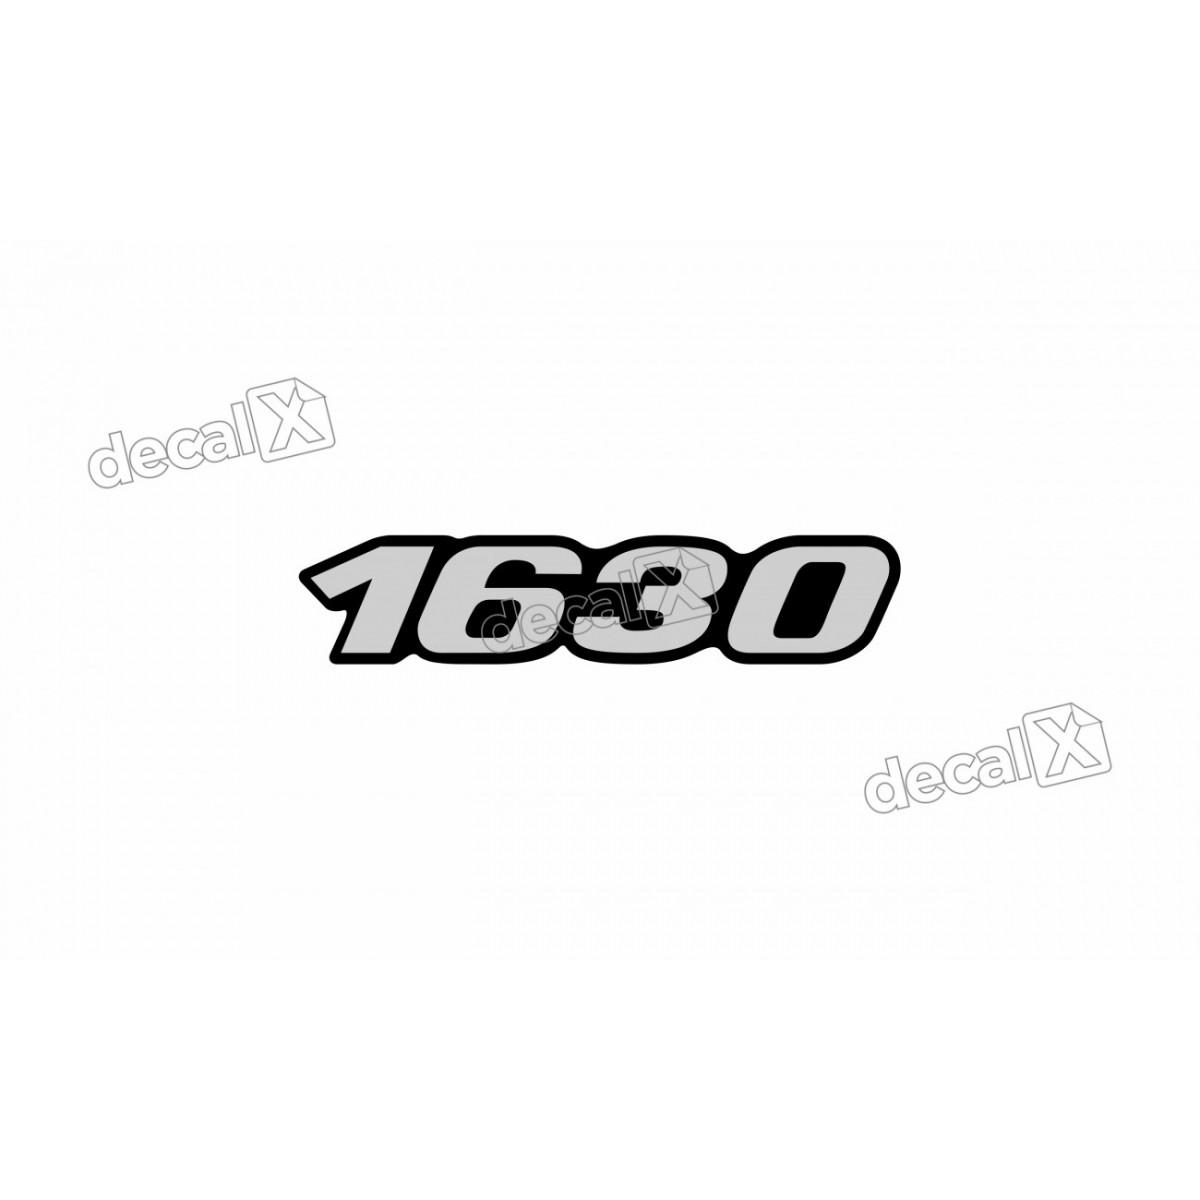 Adesivo Emblema Resinado Mercedes 1630 Cm53 Decalx